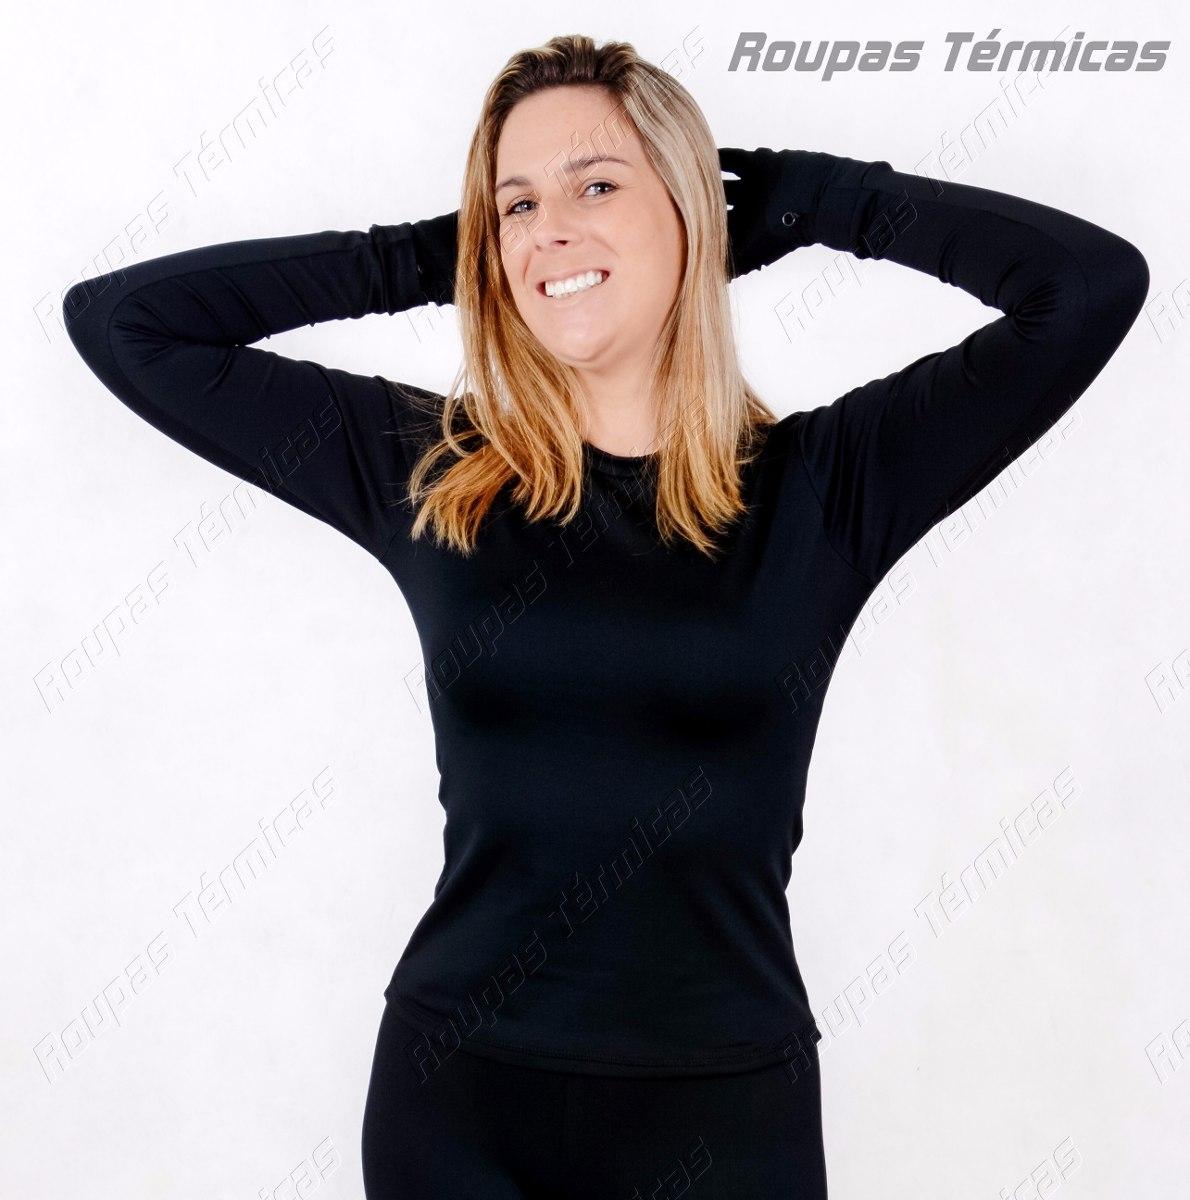 Kit Roupas Térmicas 1 Blusa 1 Calça 1 Luva 1 Meia + Brinde - R  236 ... 4d4b440cee8